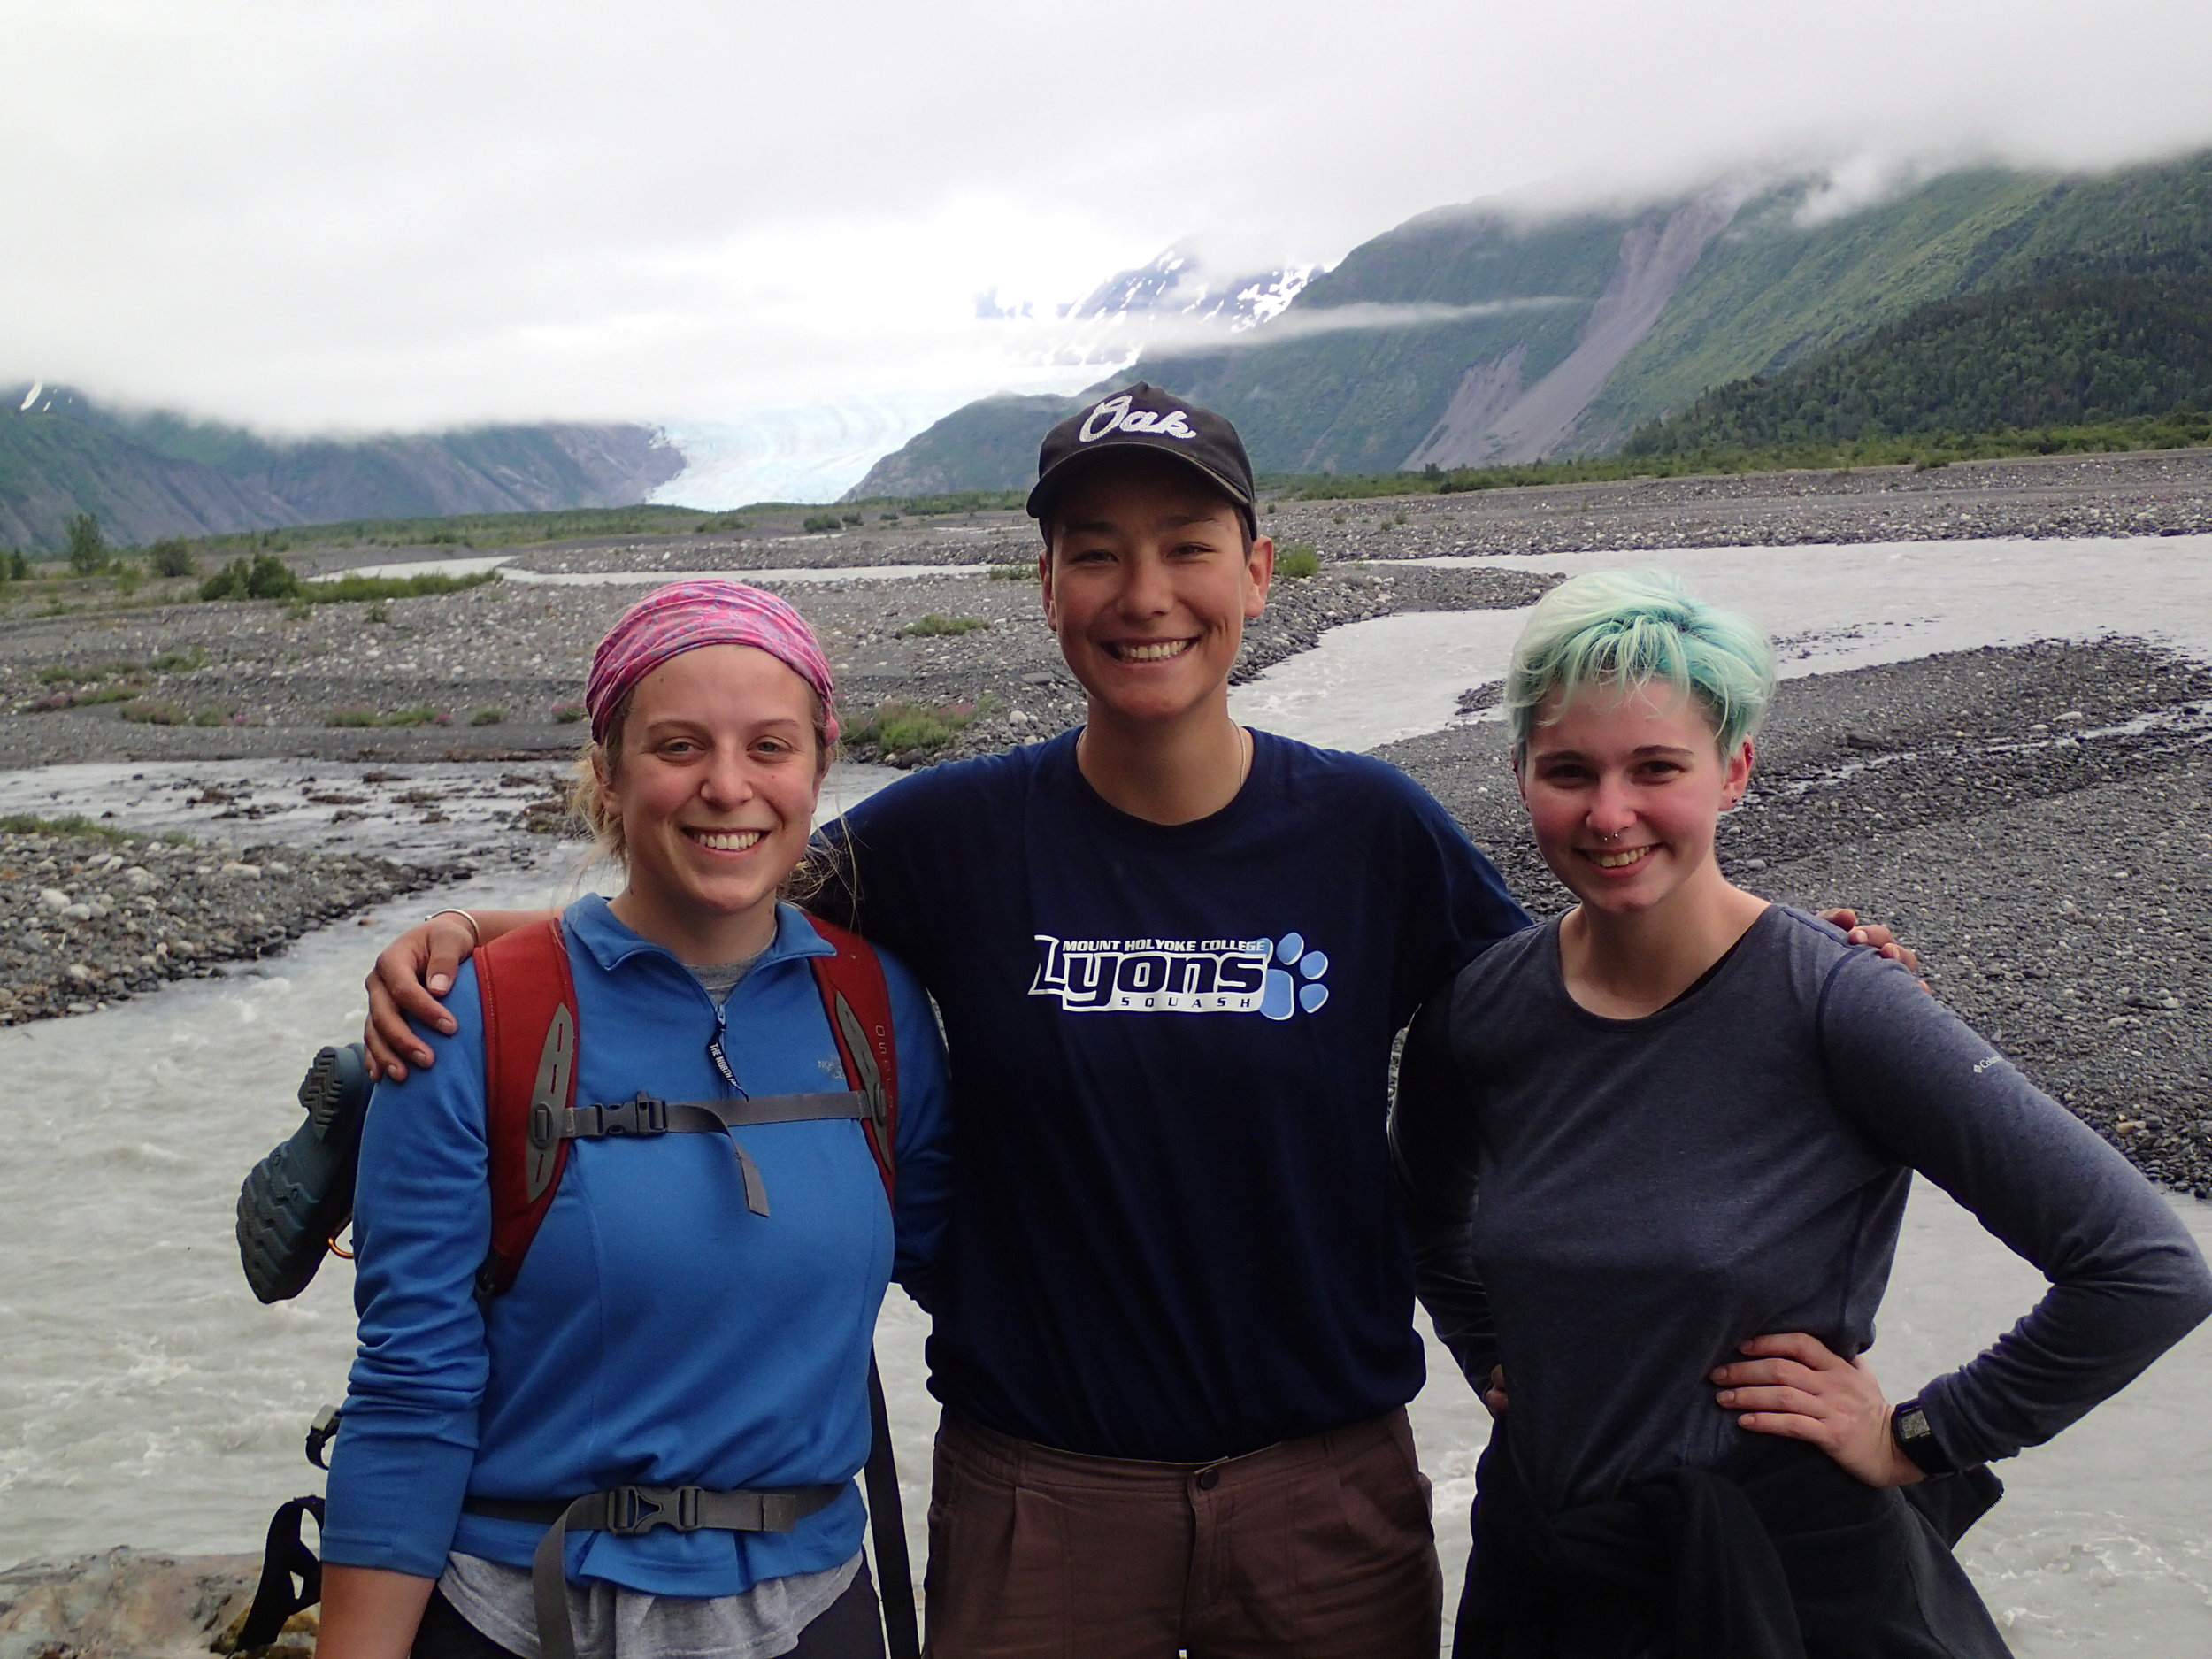 Emmy Wrobleski, Annie Wong, and Abby Boak on a hike along the Skilak River, toward Skilak glacier